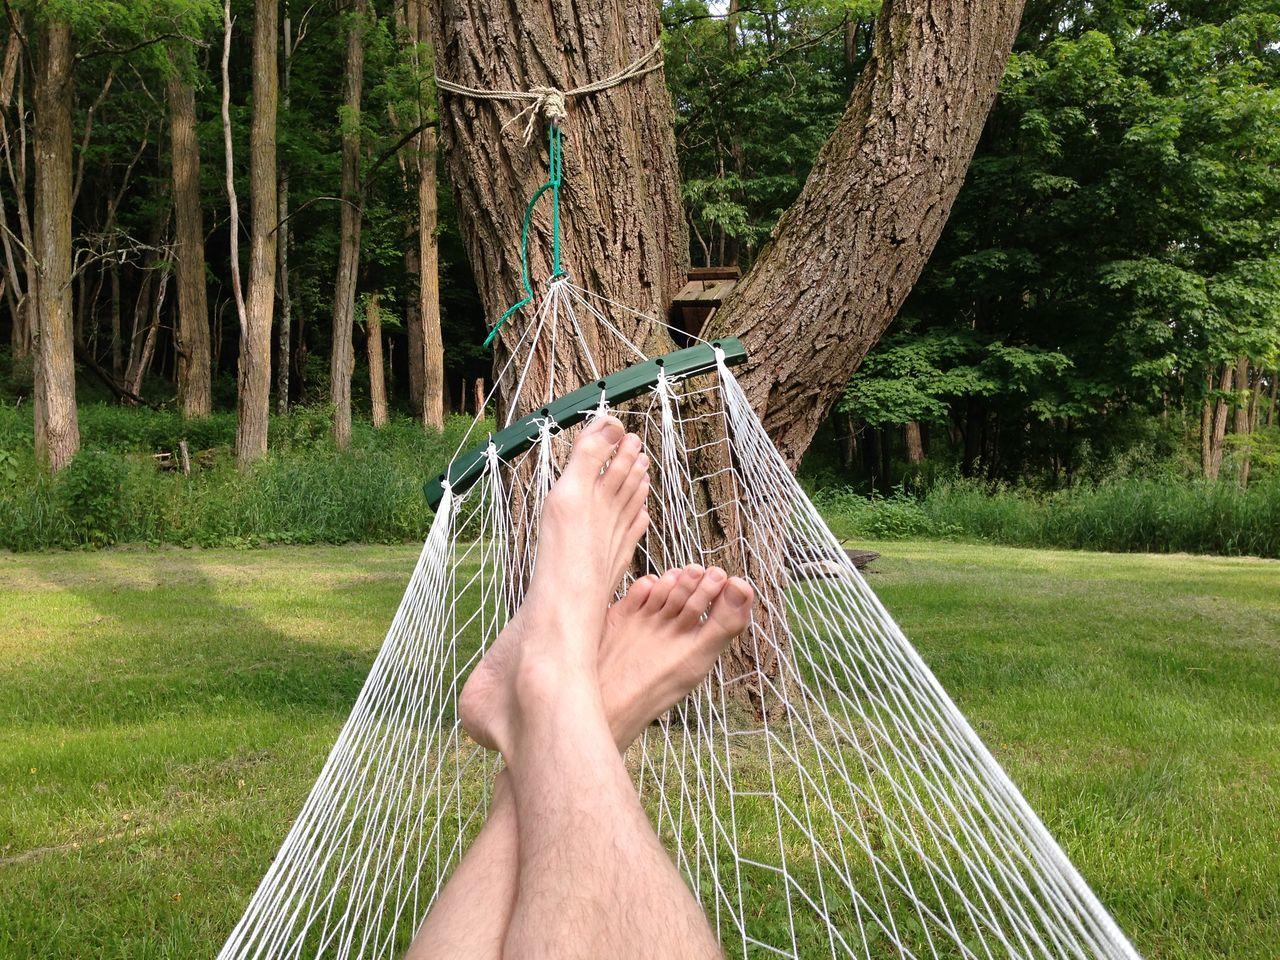 Low Section Of Man Relaxing On Hammock In Grassy Fields